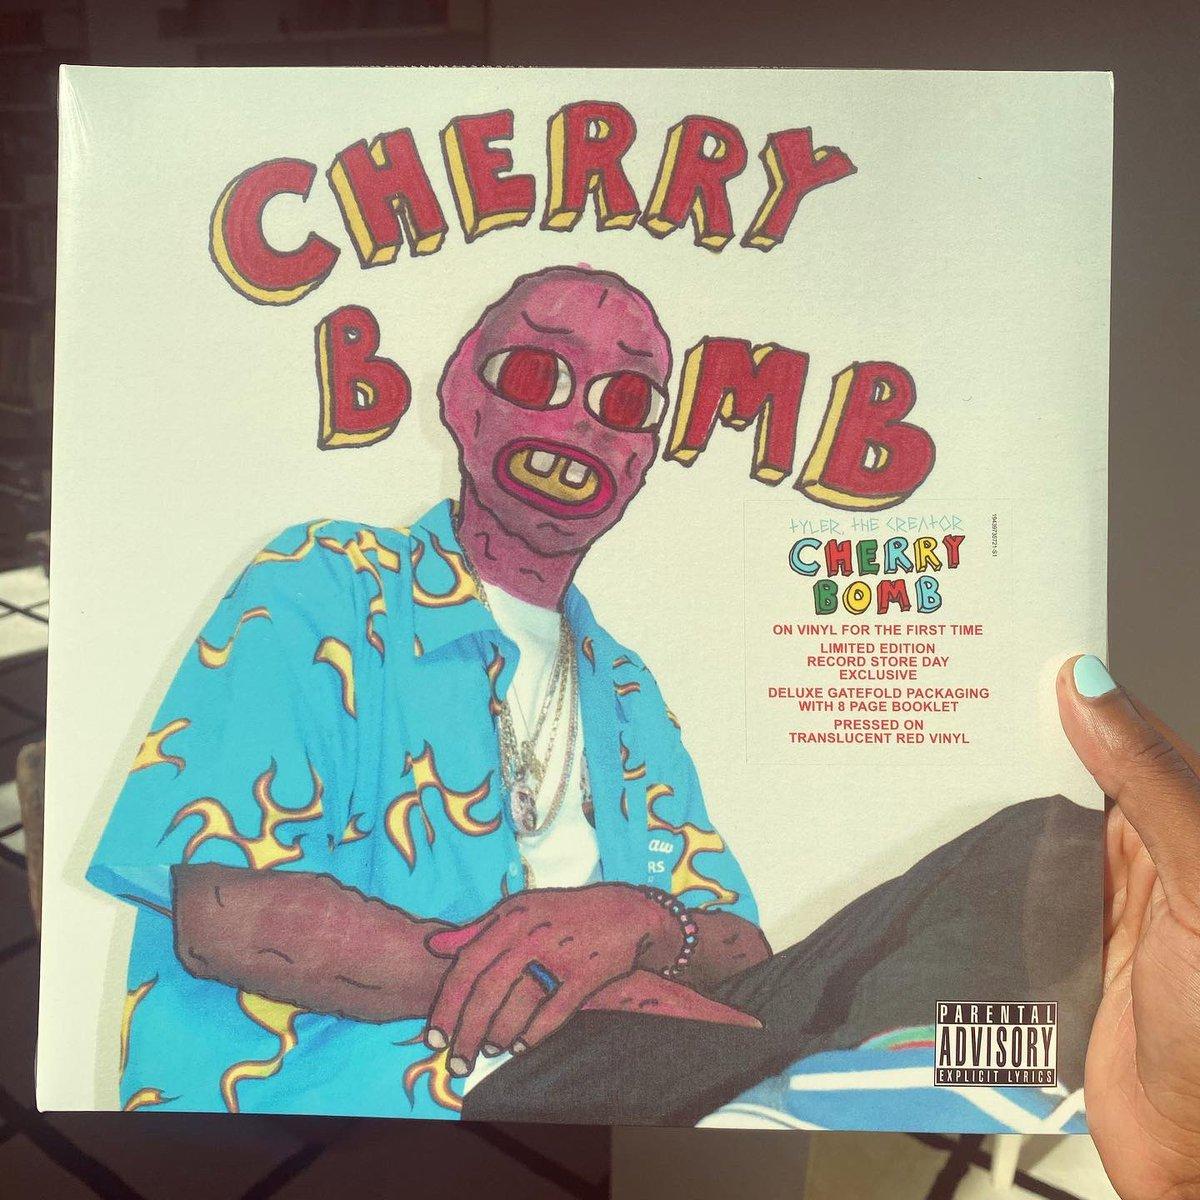 CHERRY BOMB VINYL: ALBUM / INSTRUMENTALS (FINALLY, 5 YEARS LATER) 8/29/20